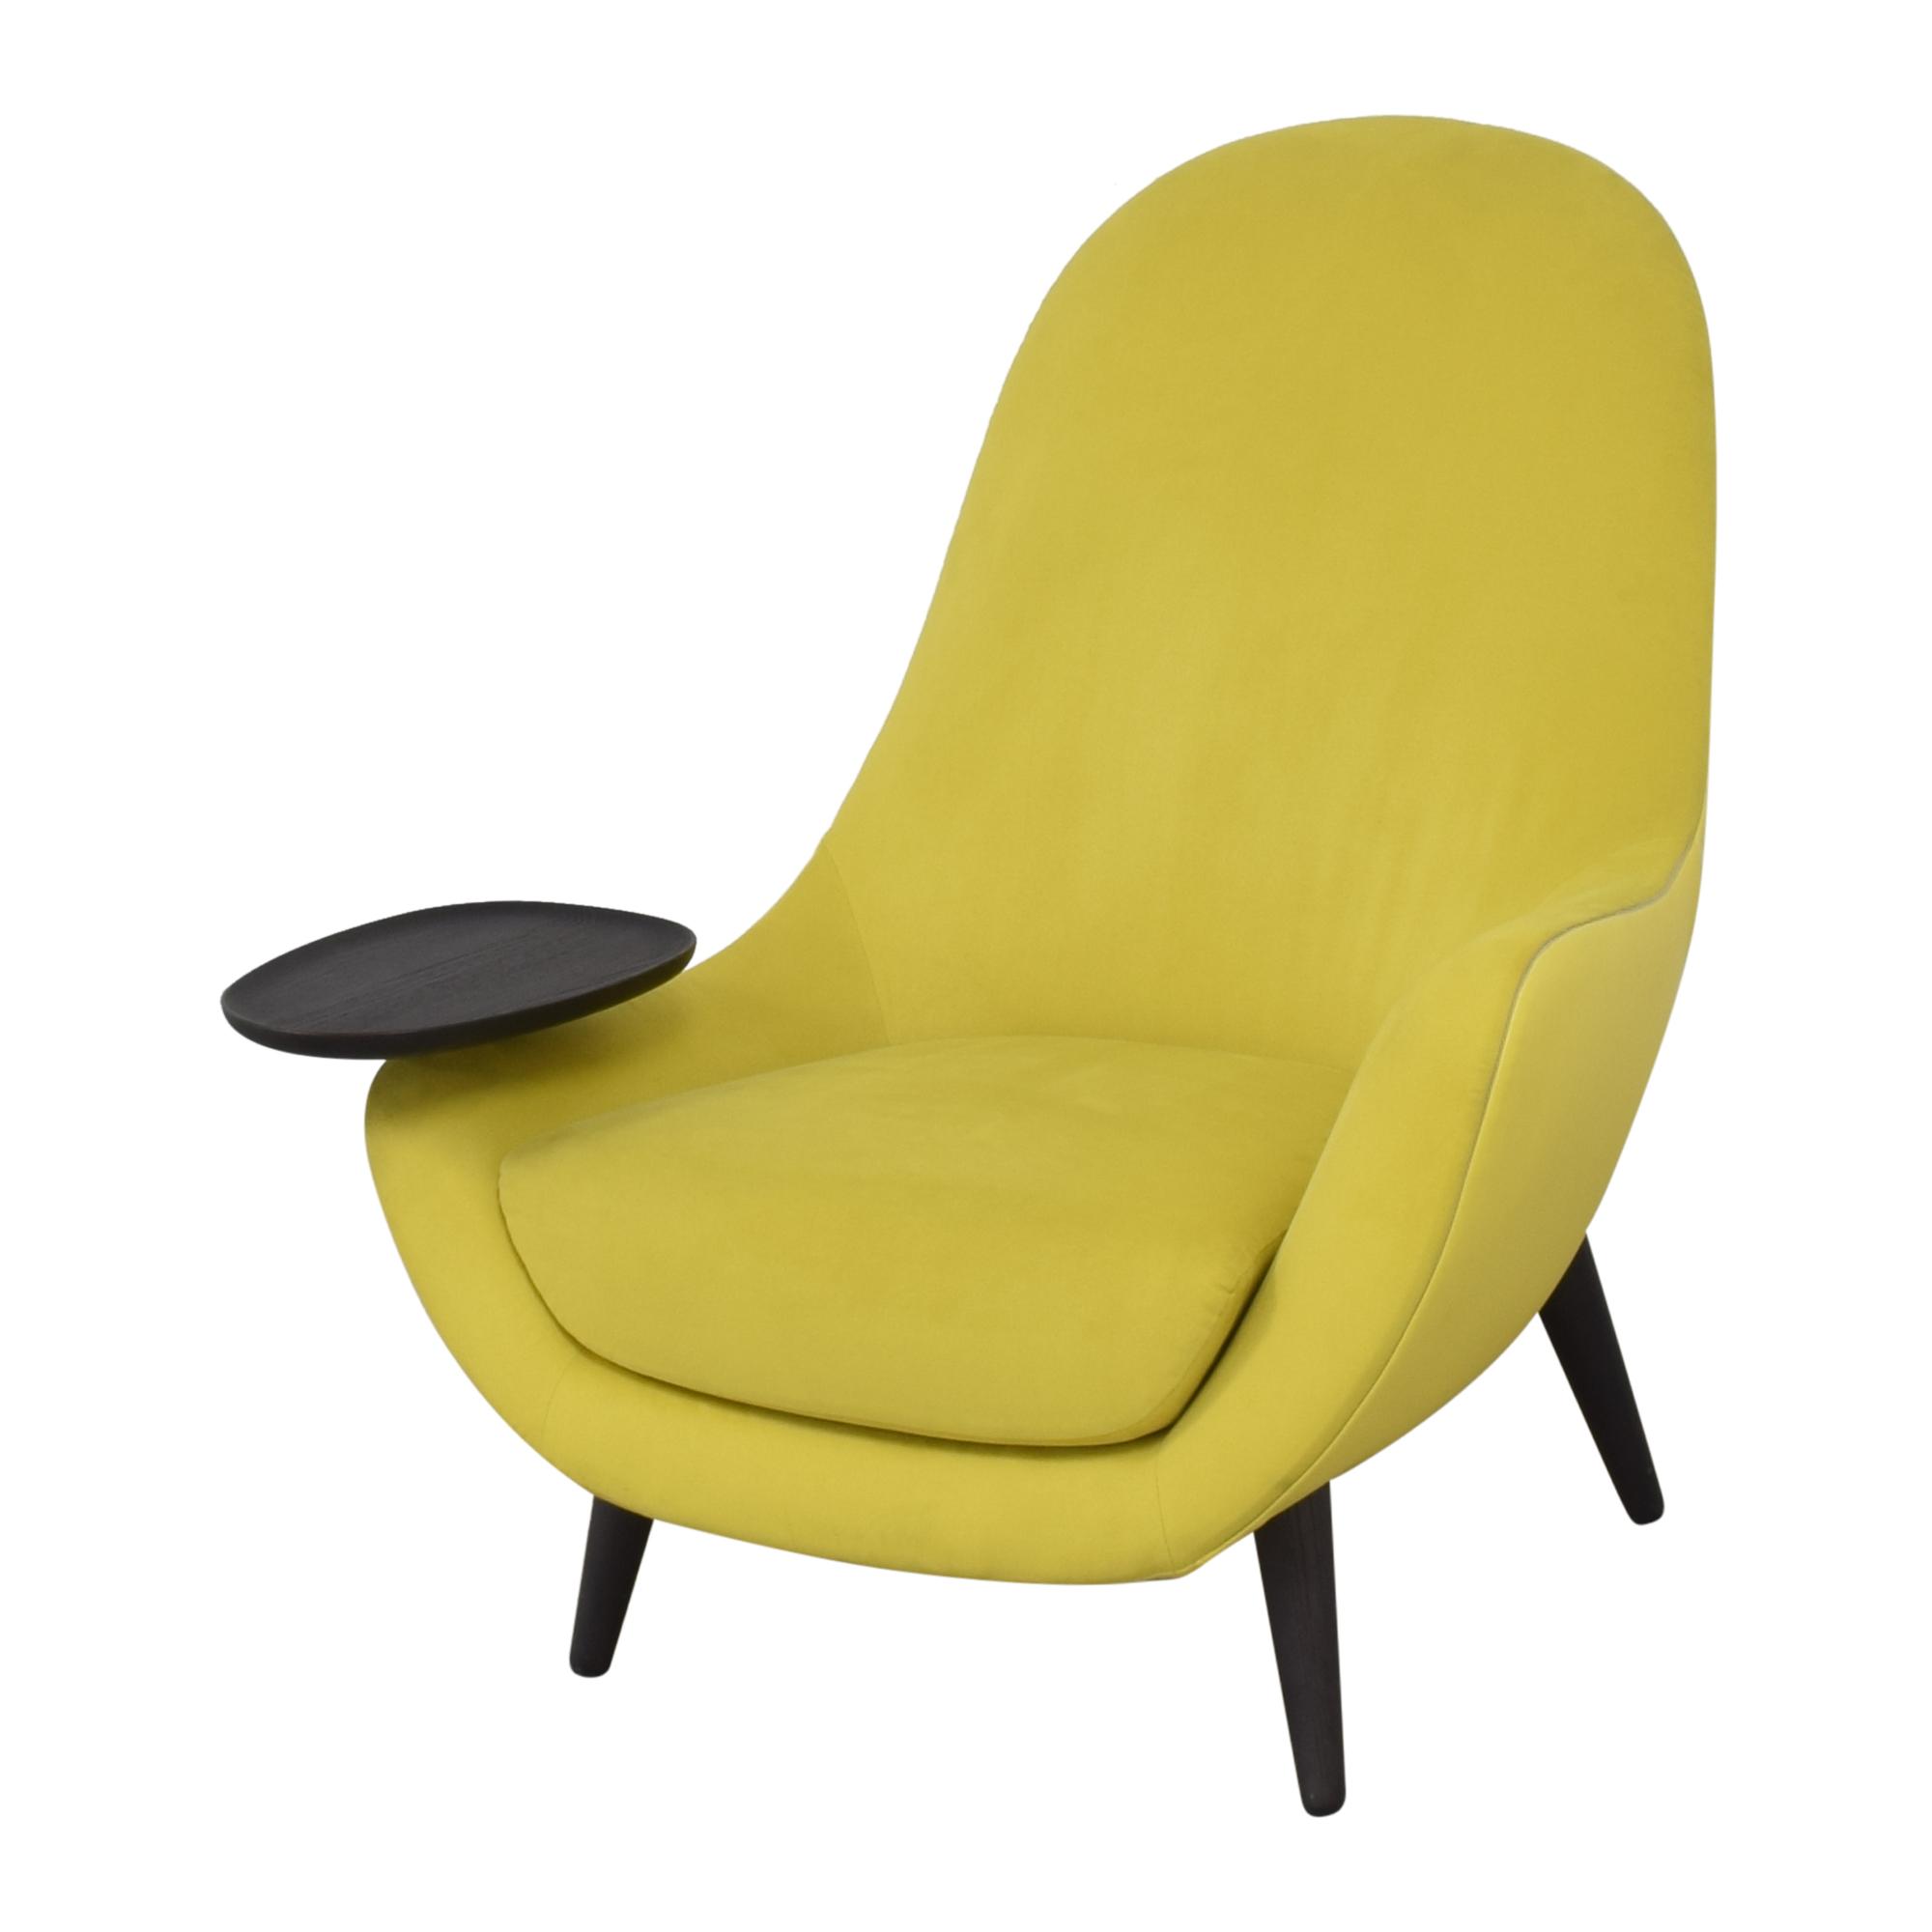 Poliform Poliform Mad King Chair